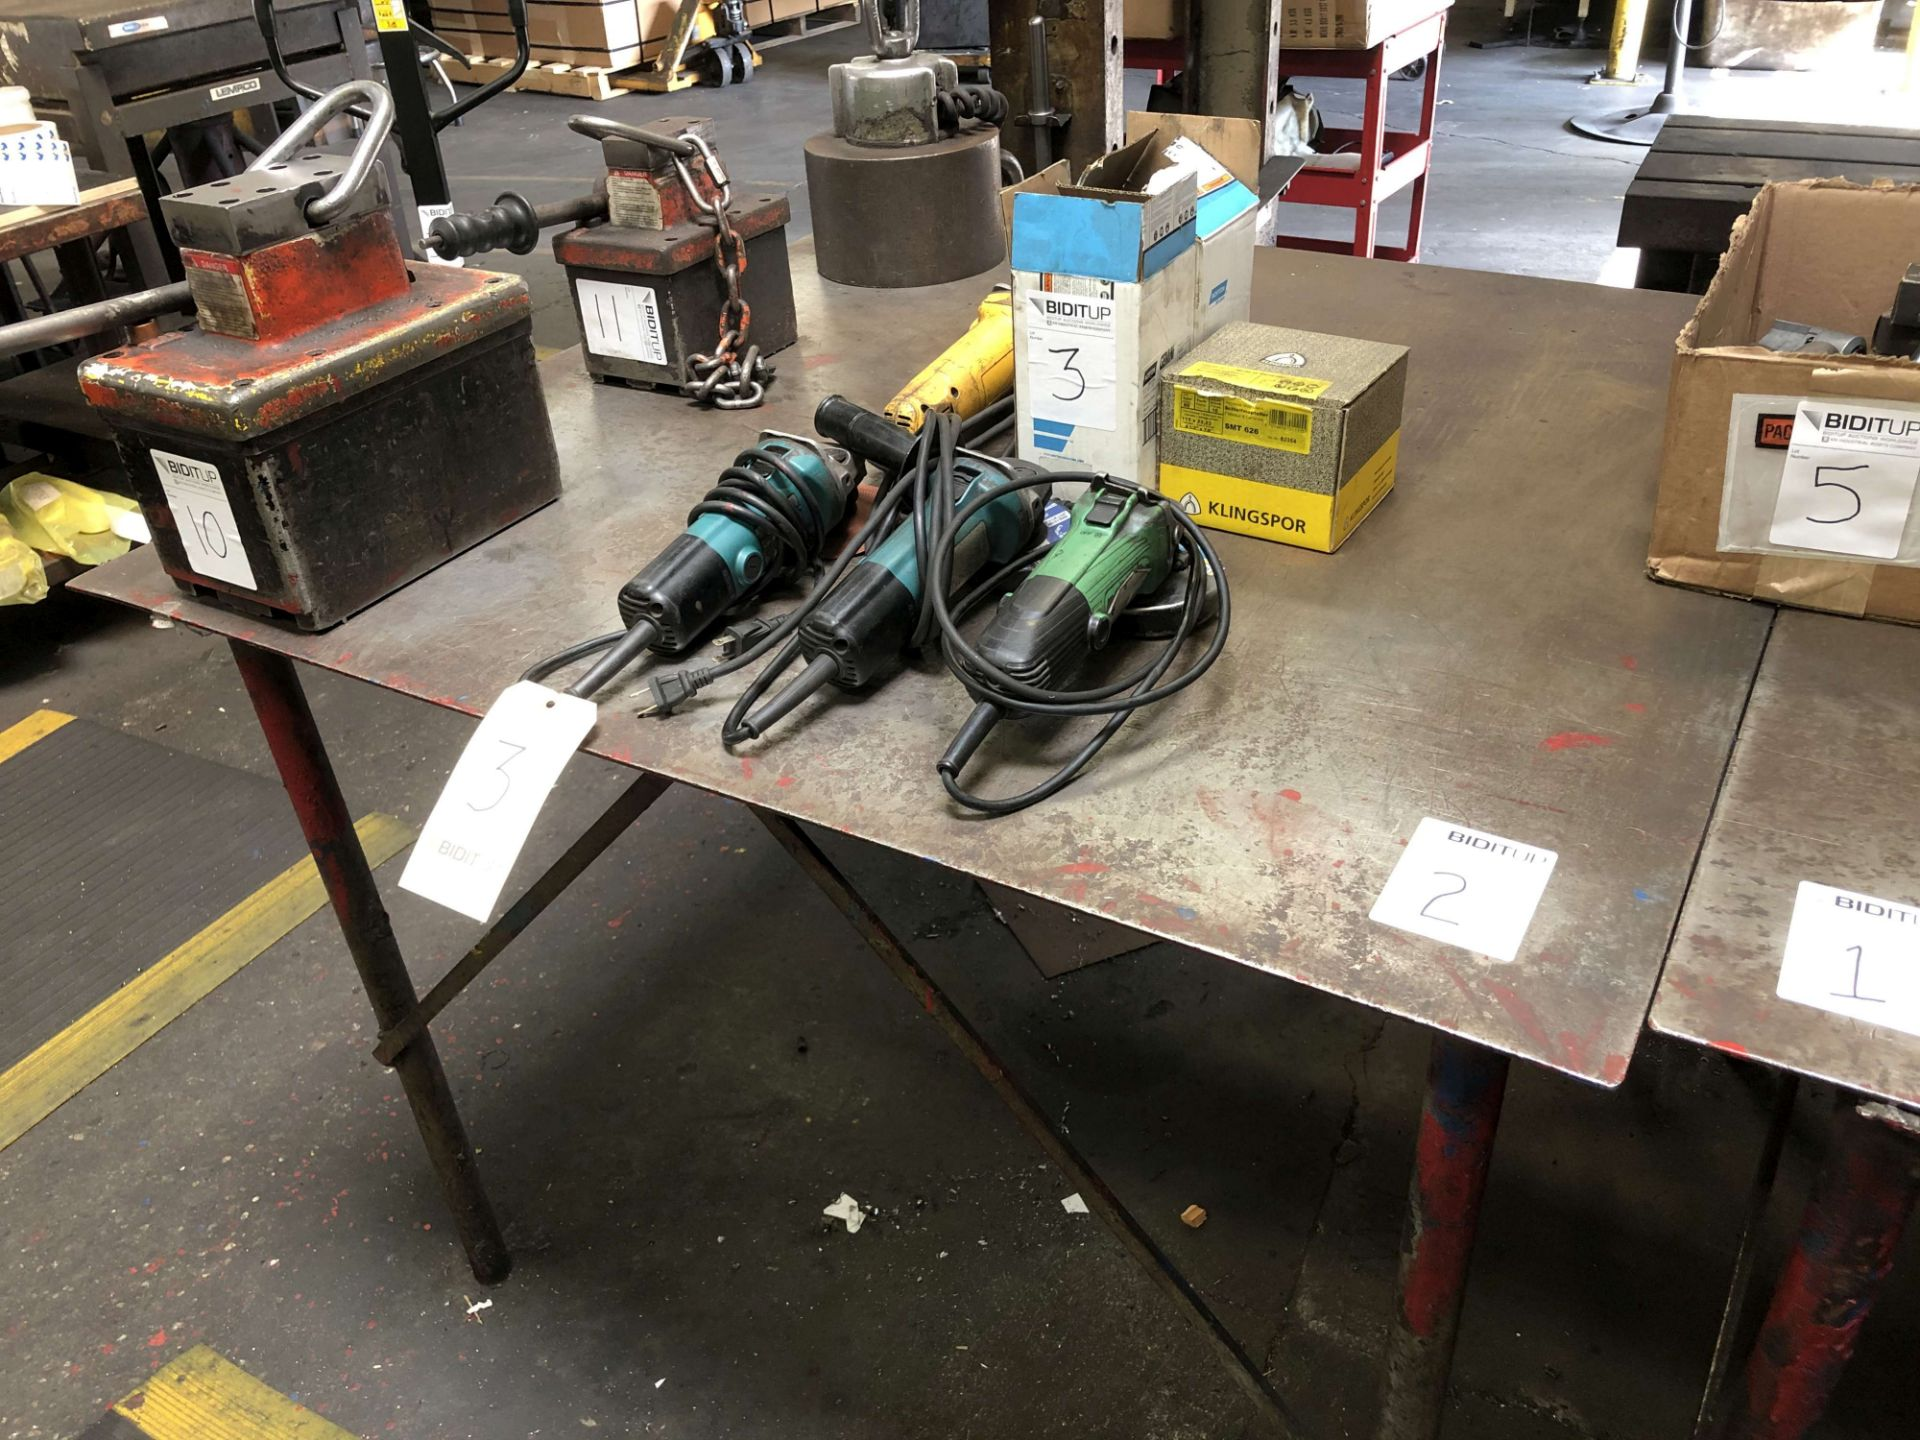 Lot 2 - Metal Table (4' x 4' x 3' High)